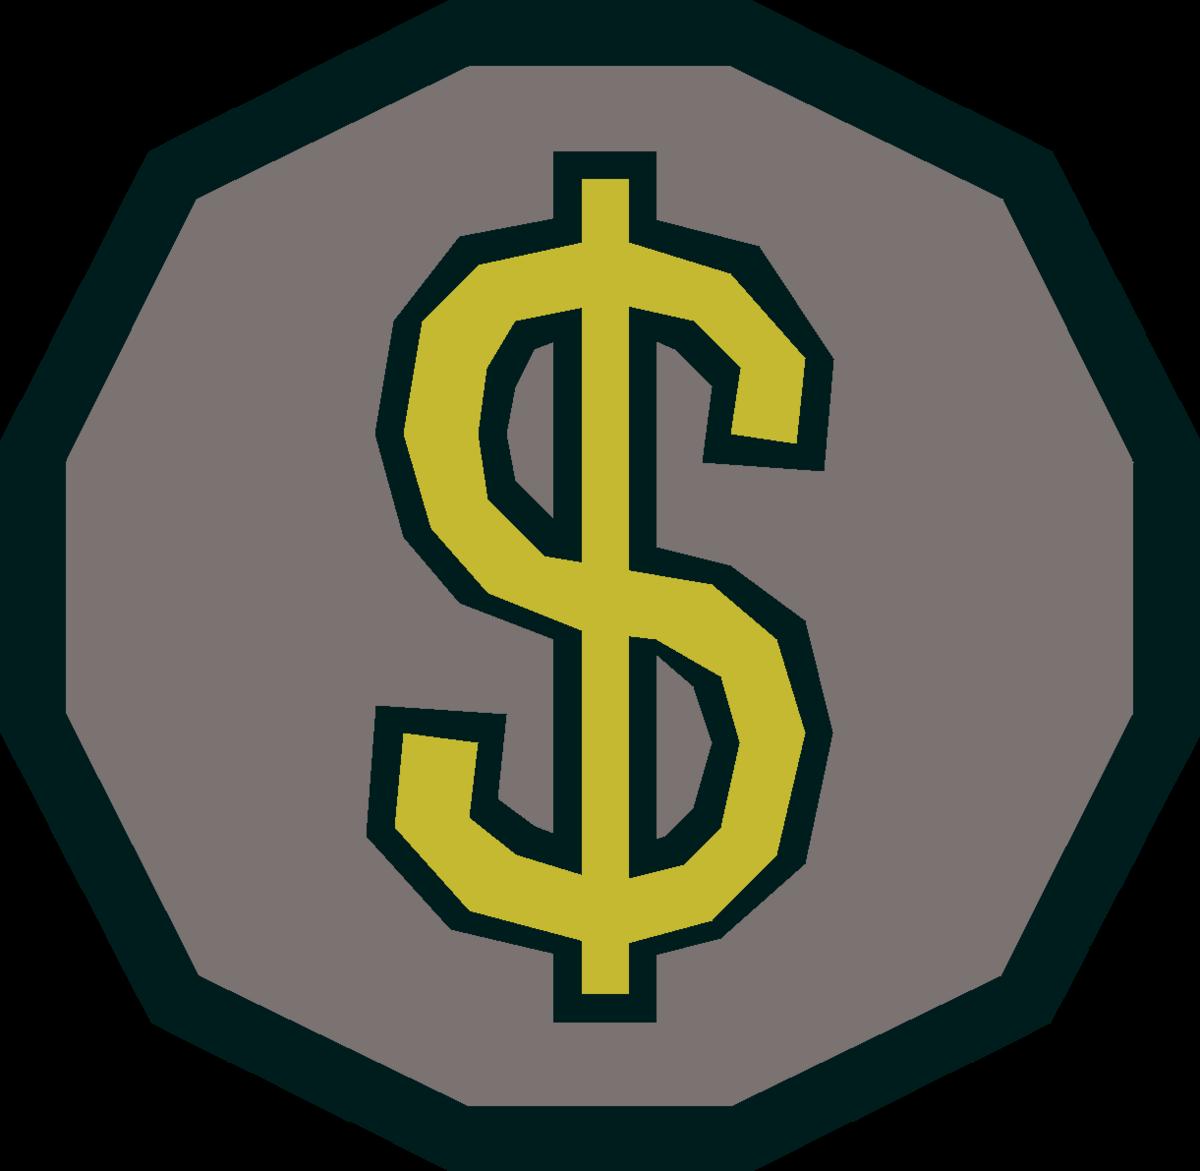 Bank - OSRS Wiki